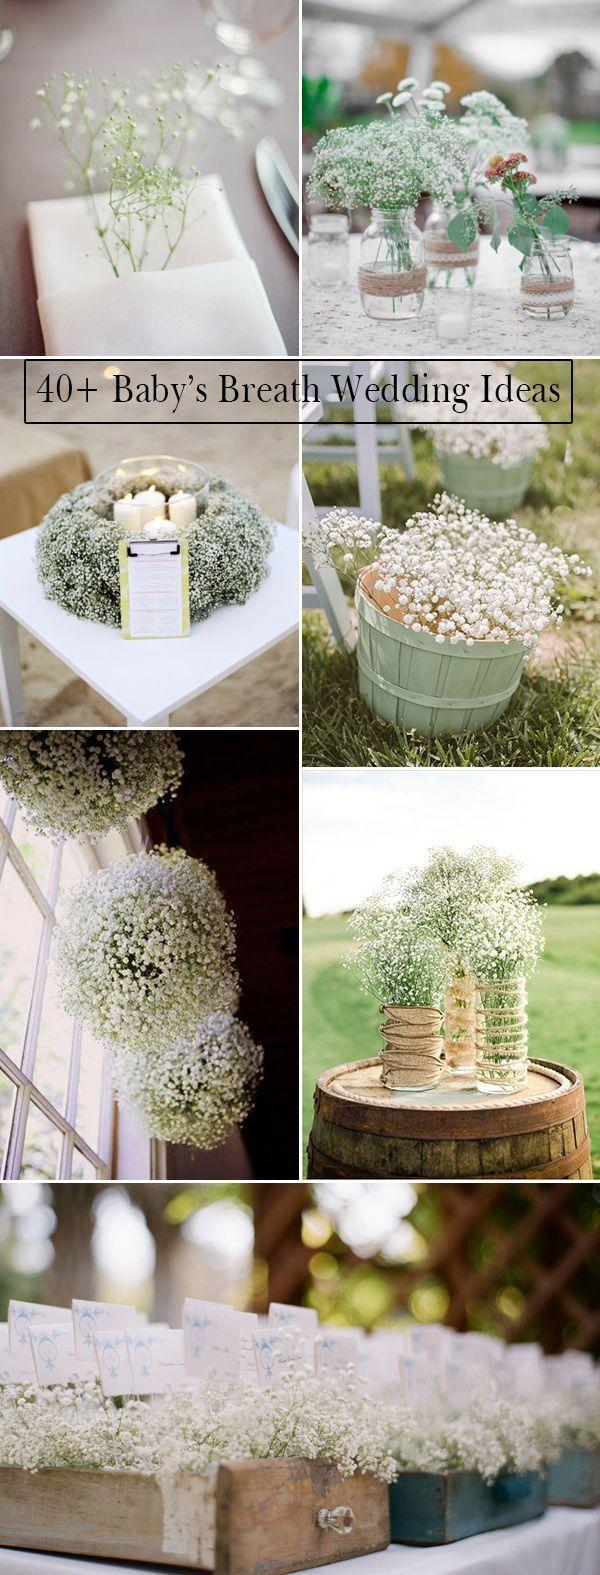 Wedding Flowers: 40 Ideas to Use Baby\'s Breath | Wedding Day Ideas ...